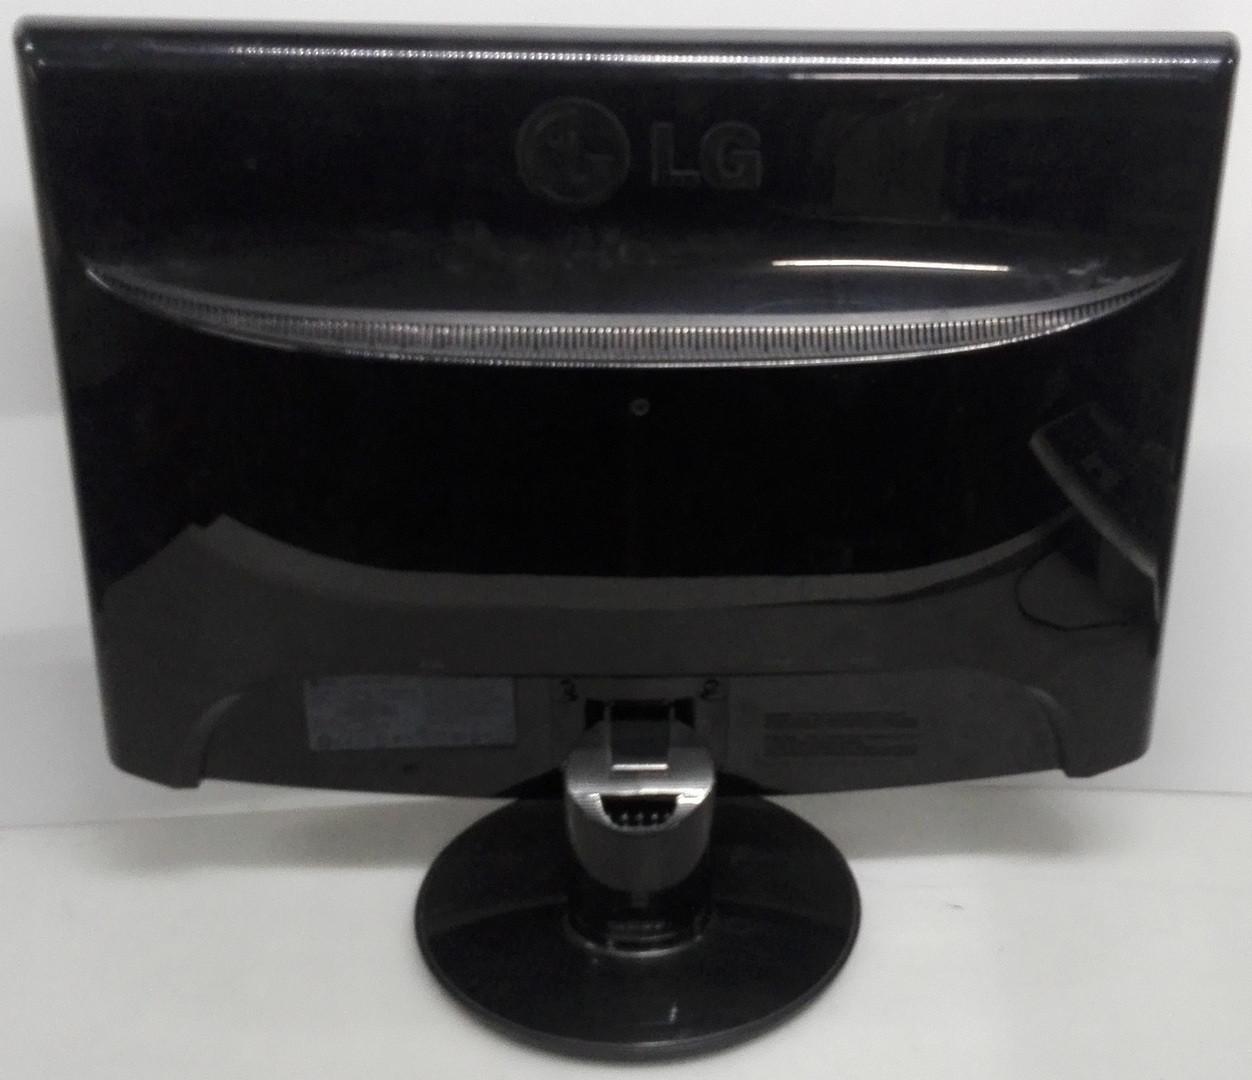 LG FLATRON W2252 WINDOWS 8.1 DRIVER DOWNLOAD